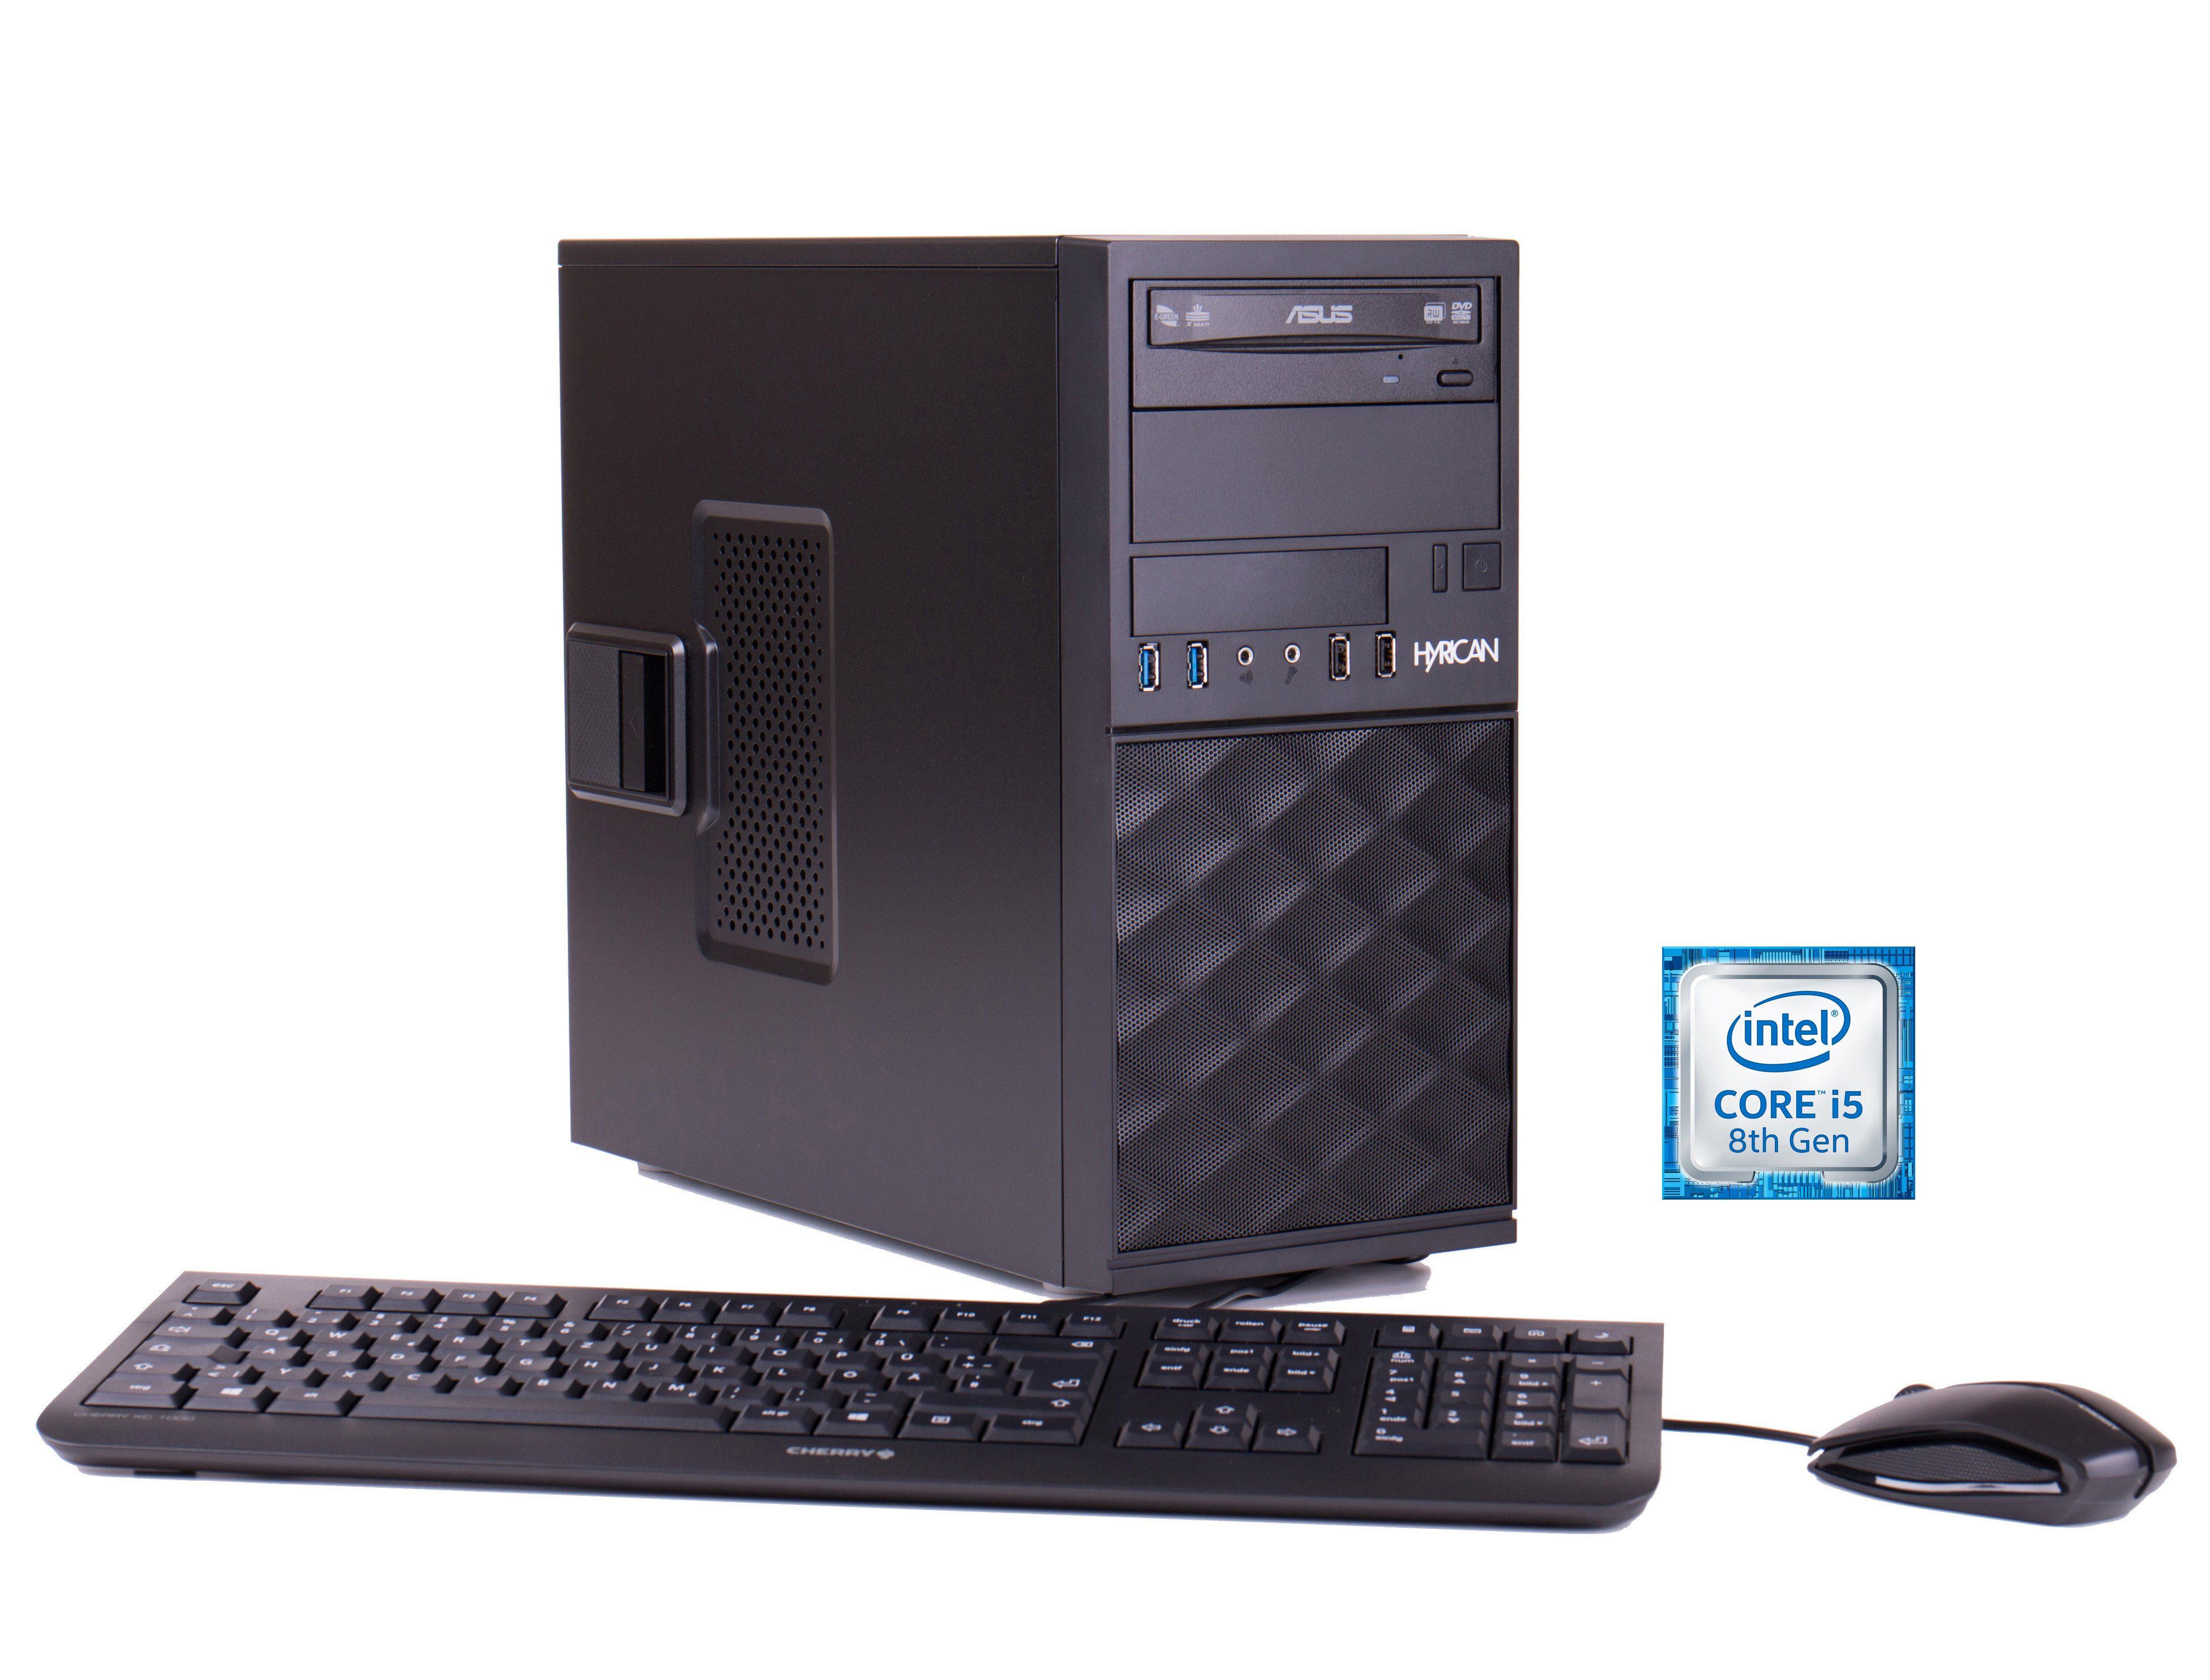 HYRICAN ProBusiness PC i5-8400 8GB 500GB PCIe SSD GTX 1070 Win 10 Pro »Workstation CTS00502«